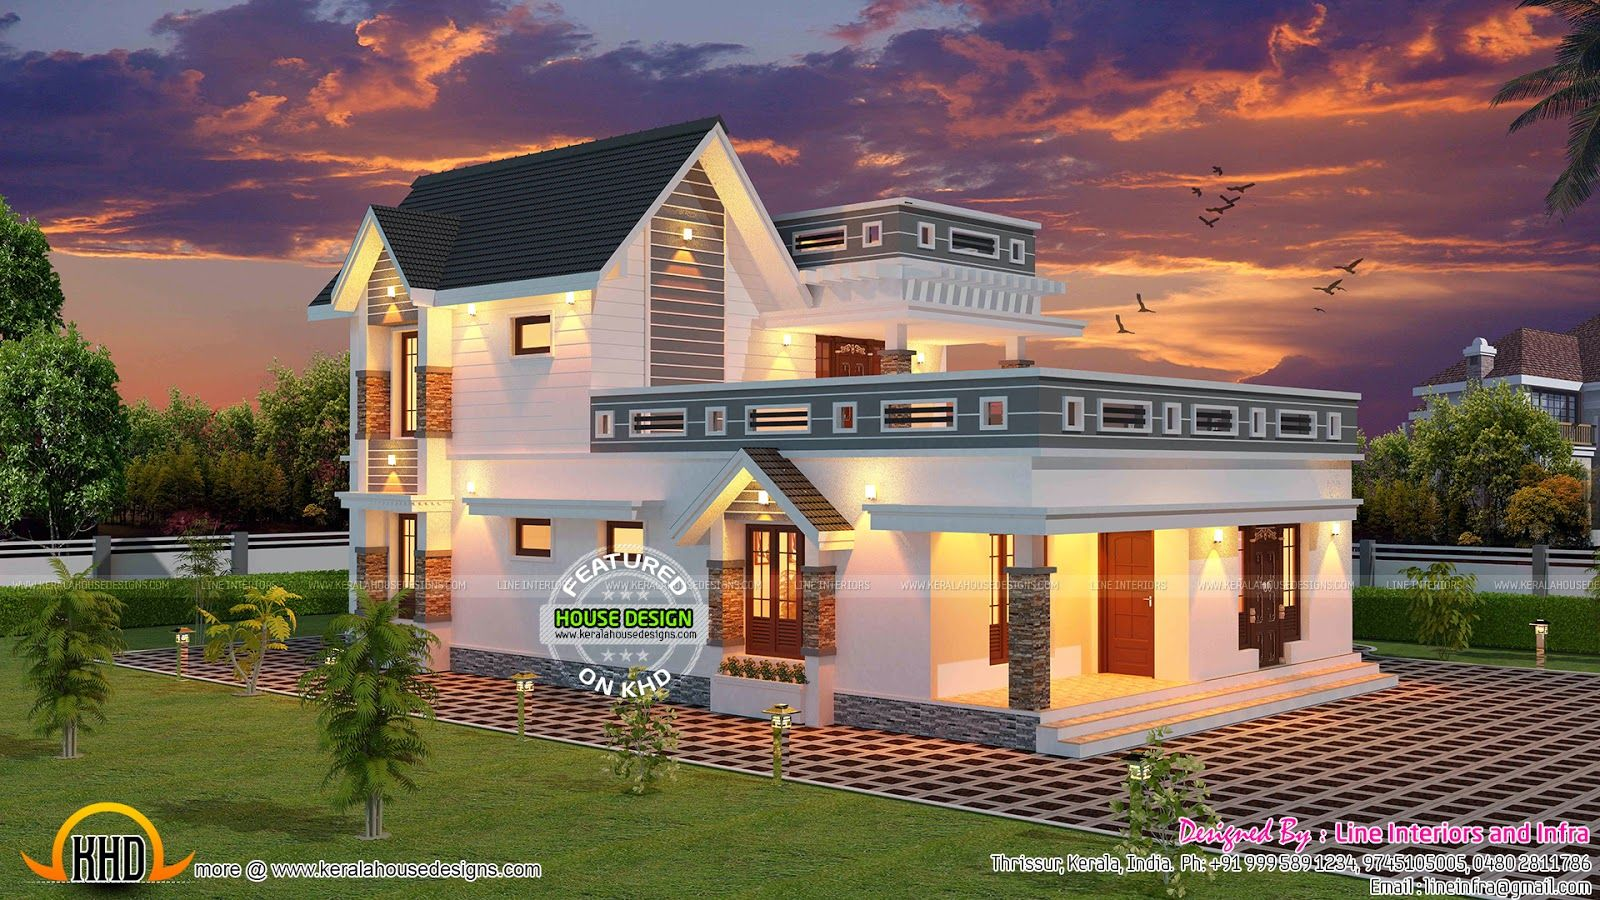 House design vastu - Vastu Based House Plan Jpg 1 600 900 Pixels